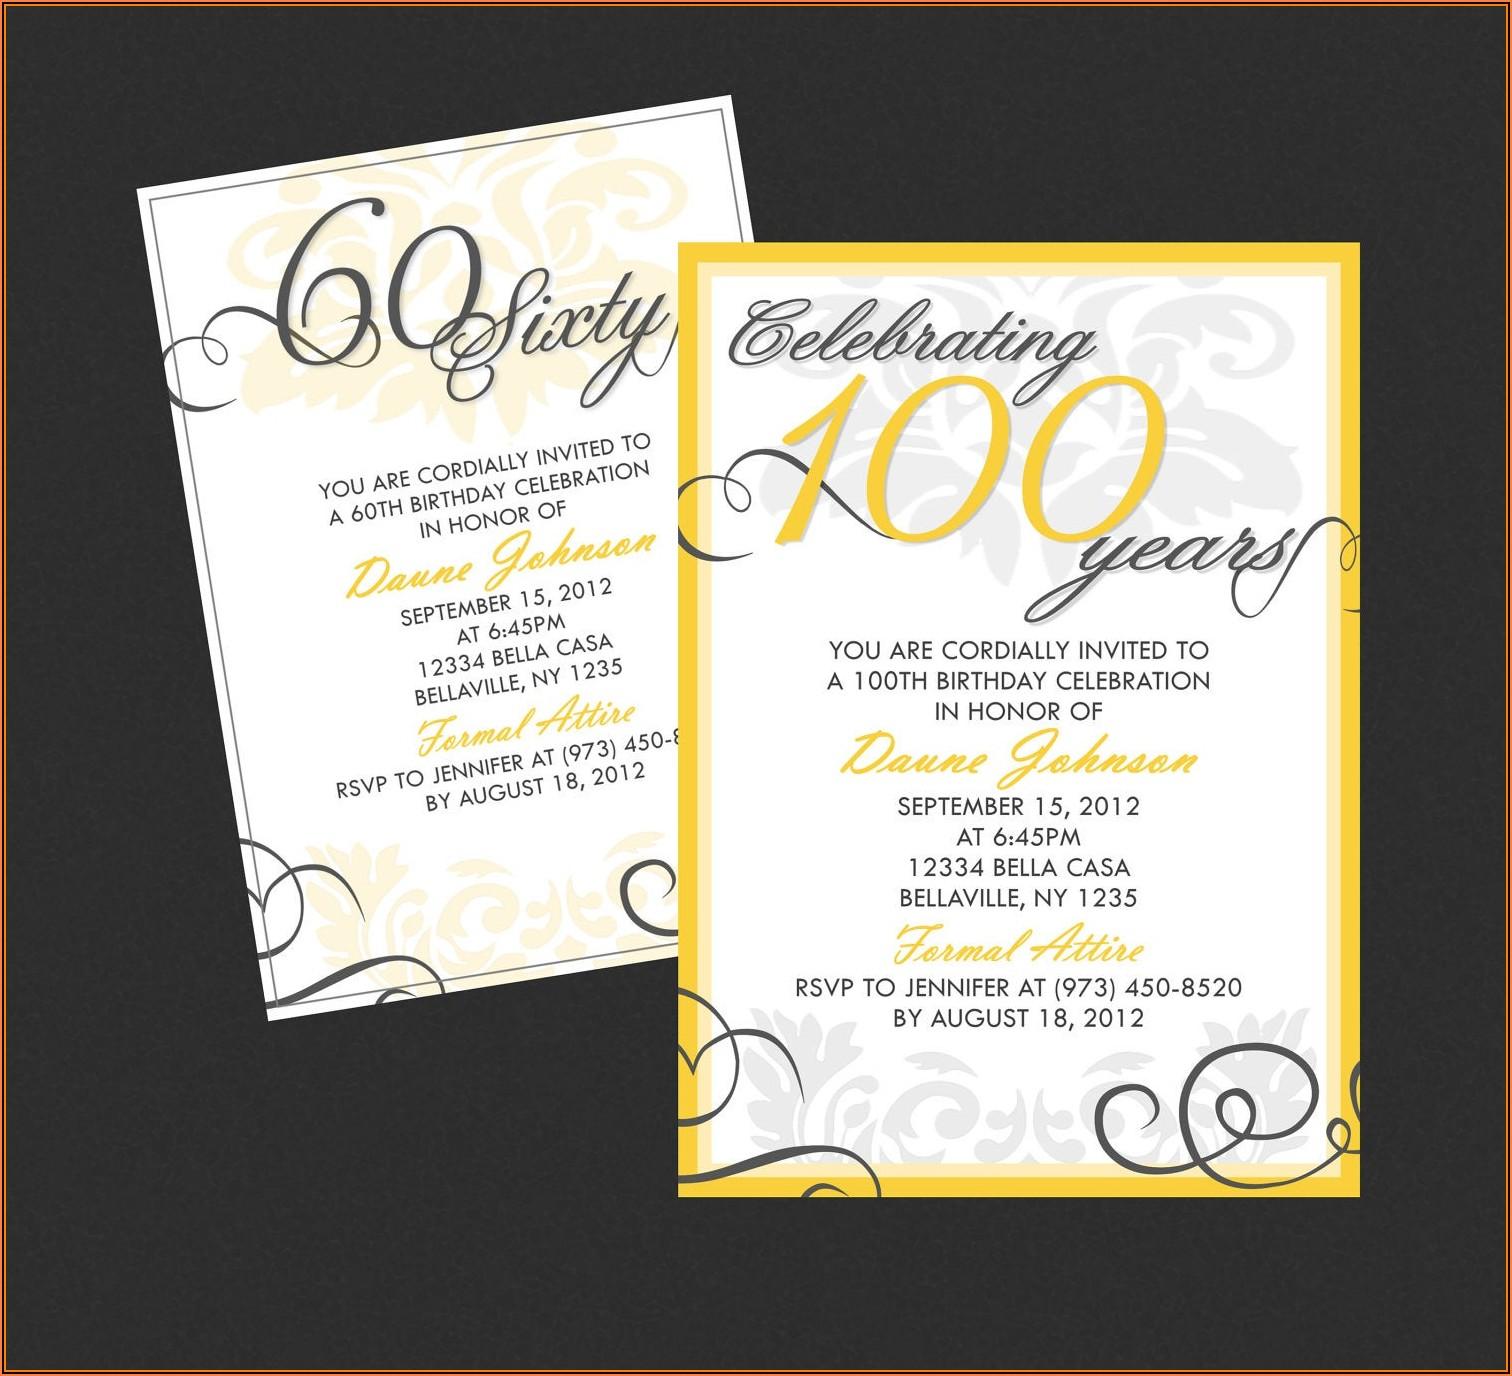 Free Classy Birthday Invitation Templates